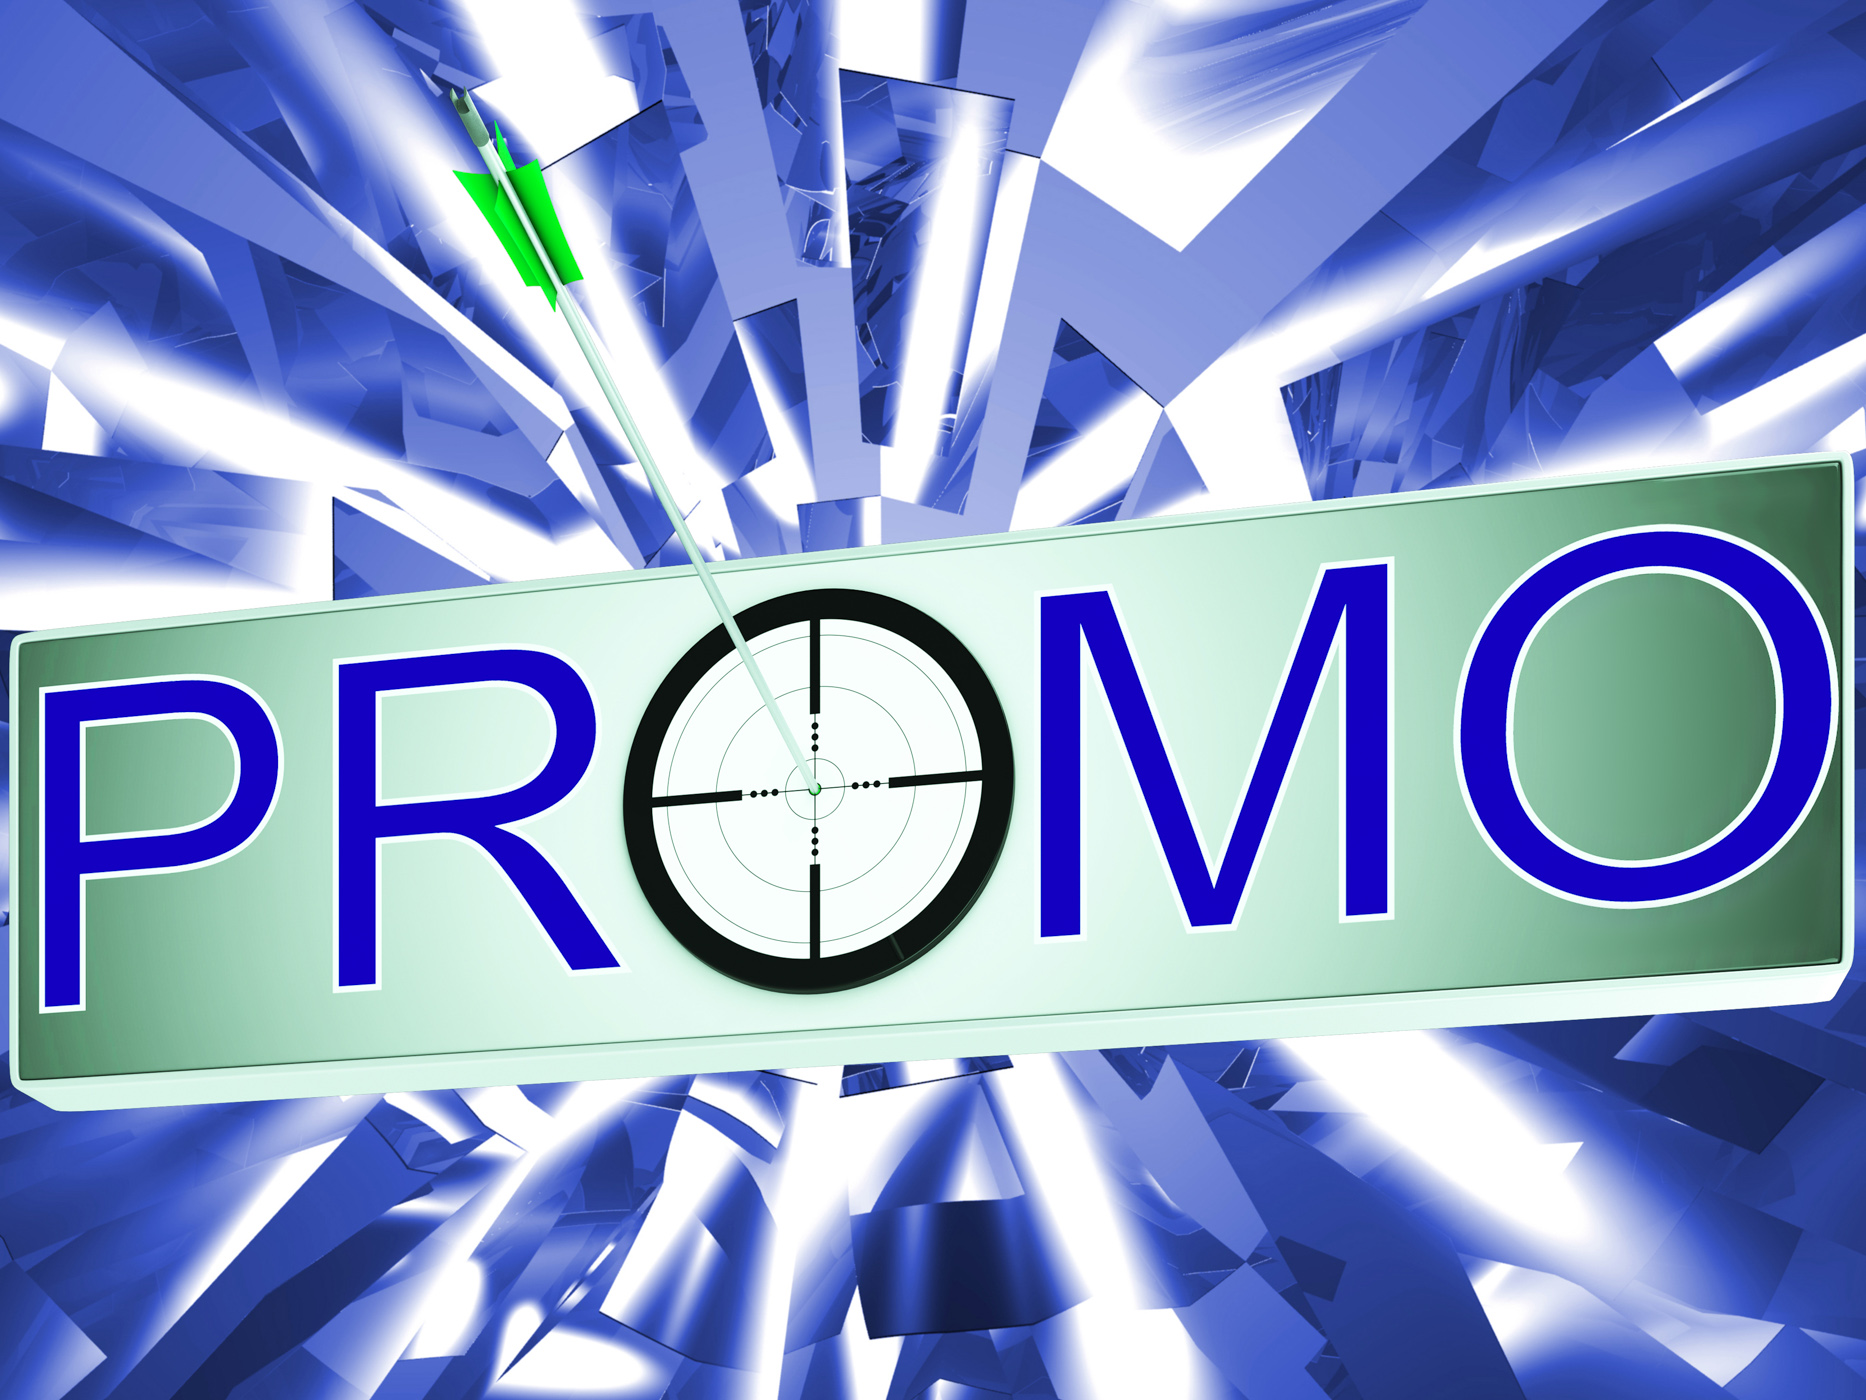 Promo shows promotion discount sale photo